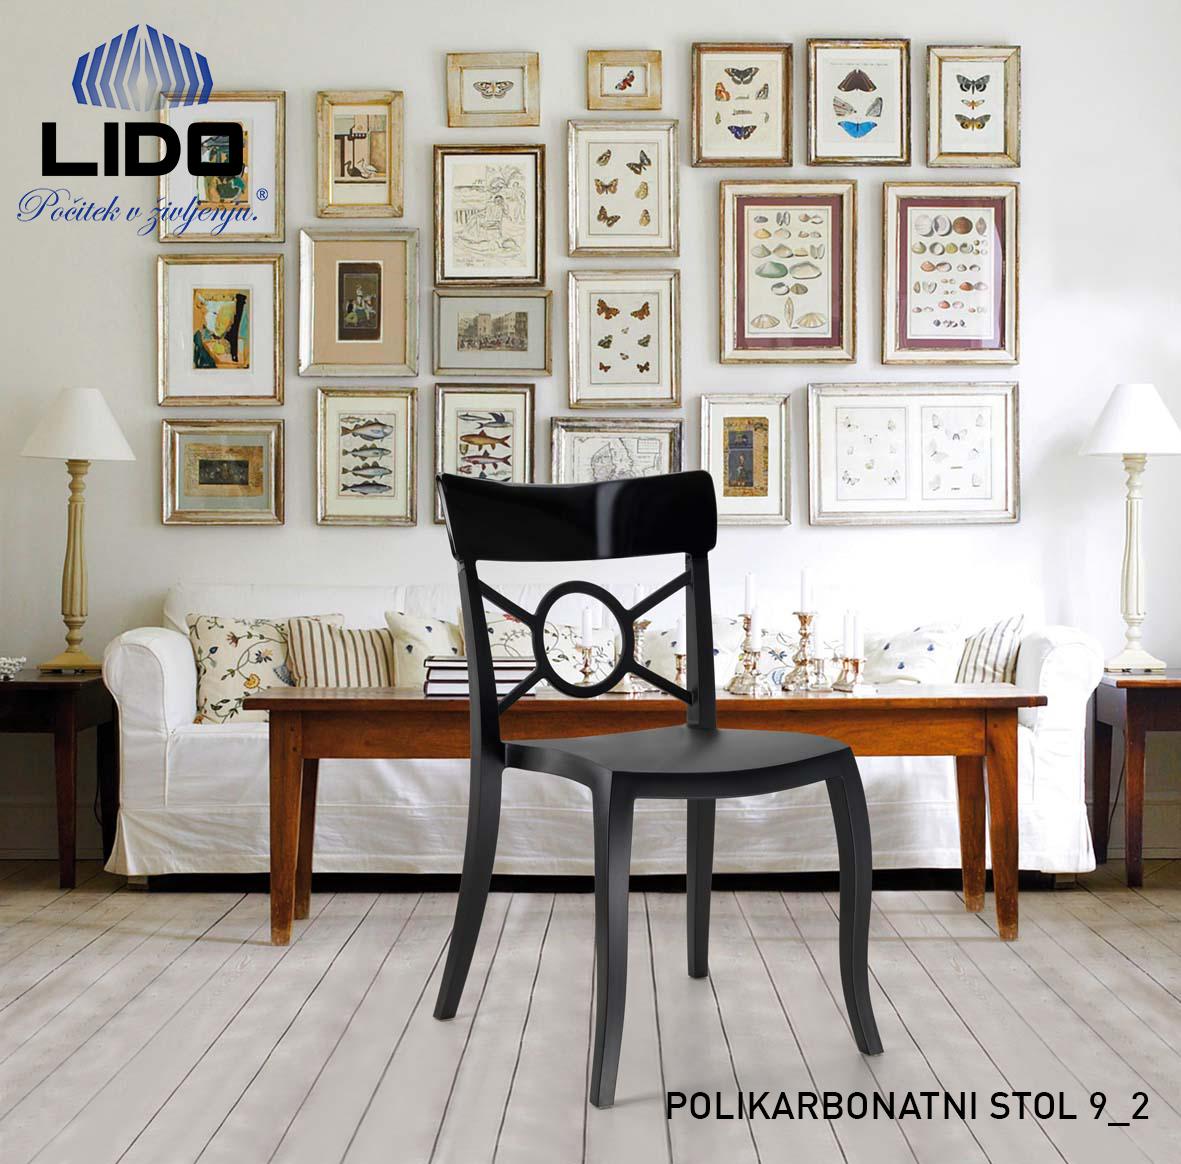 Lido_Polikarbonatni stol 9_2